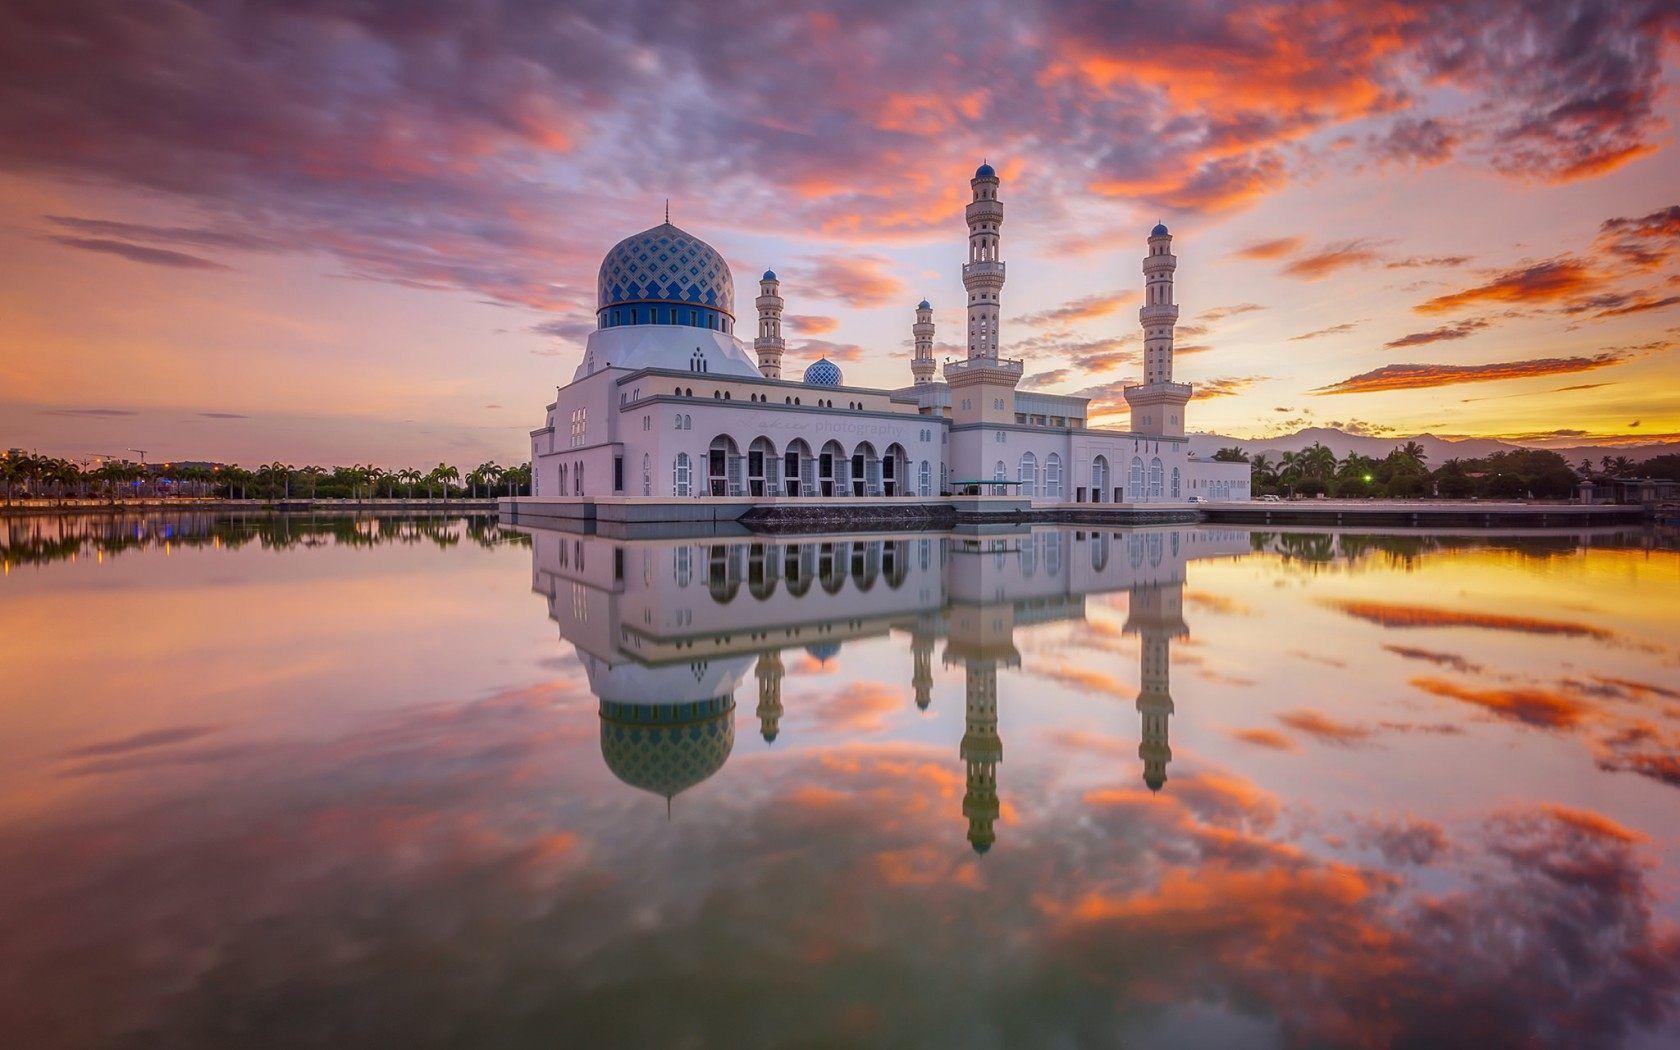 full hd kota kinabalu mosque desktop wallpaper download free for